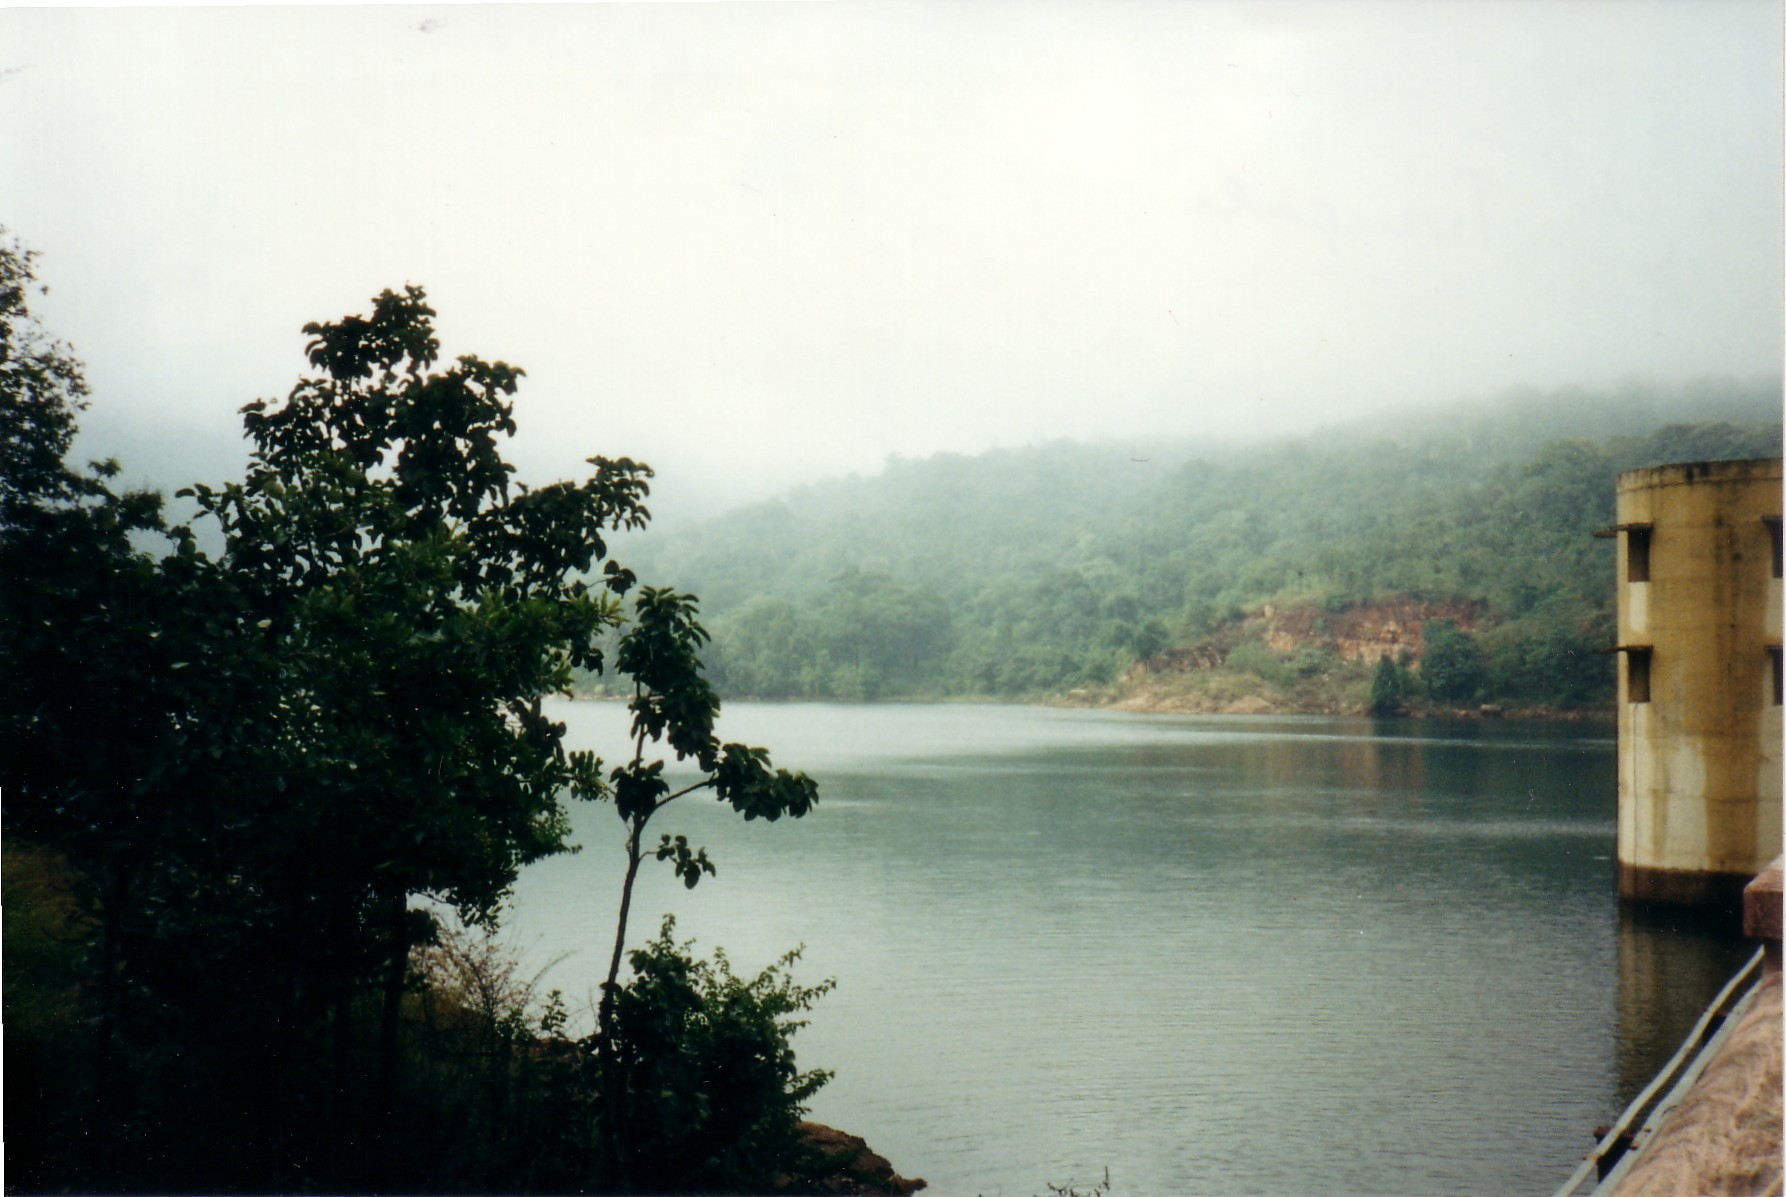 Tirupati lakeTirupati lake